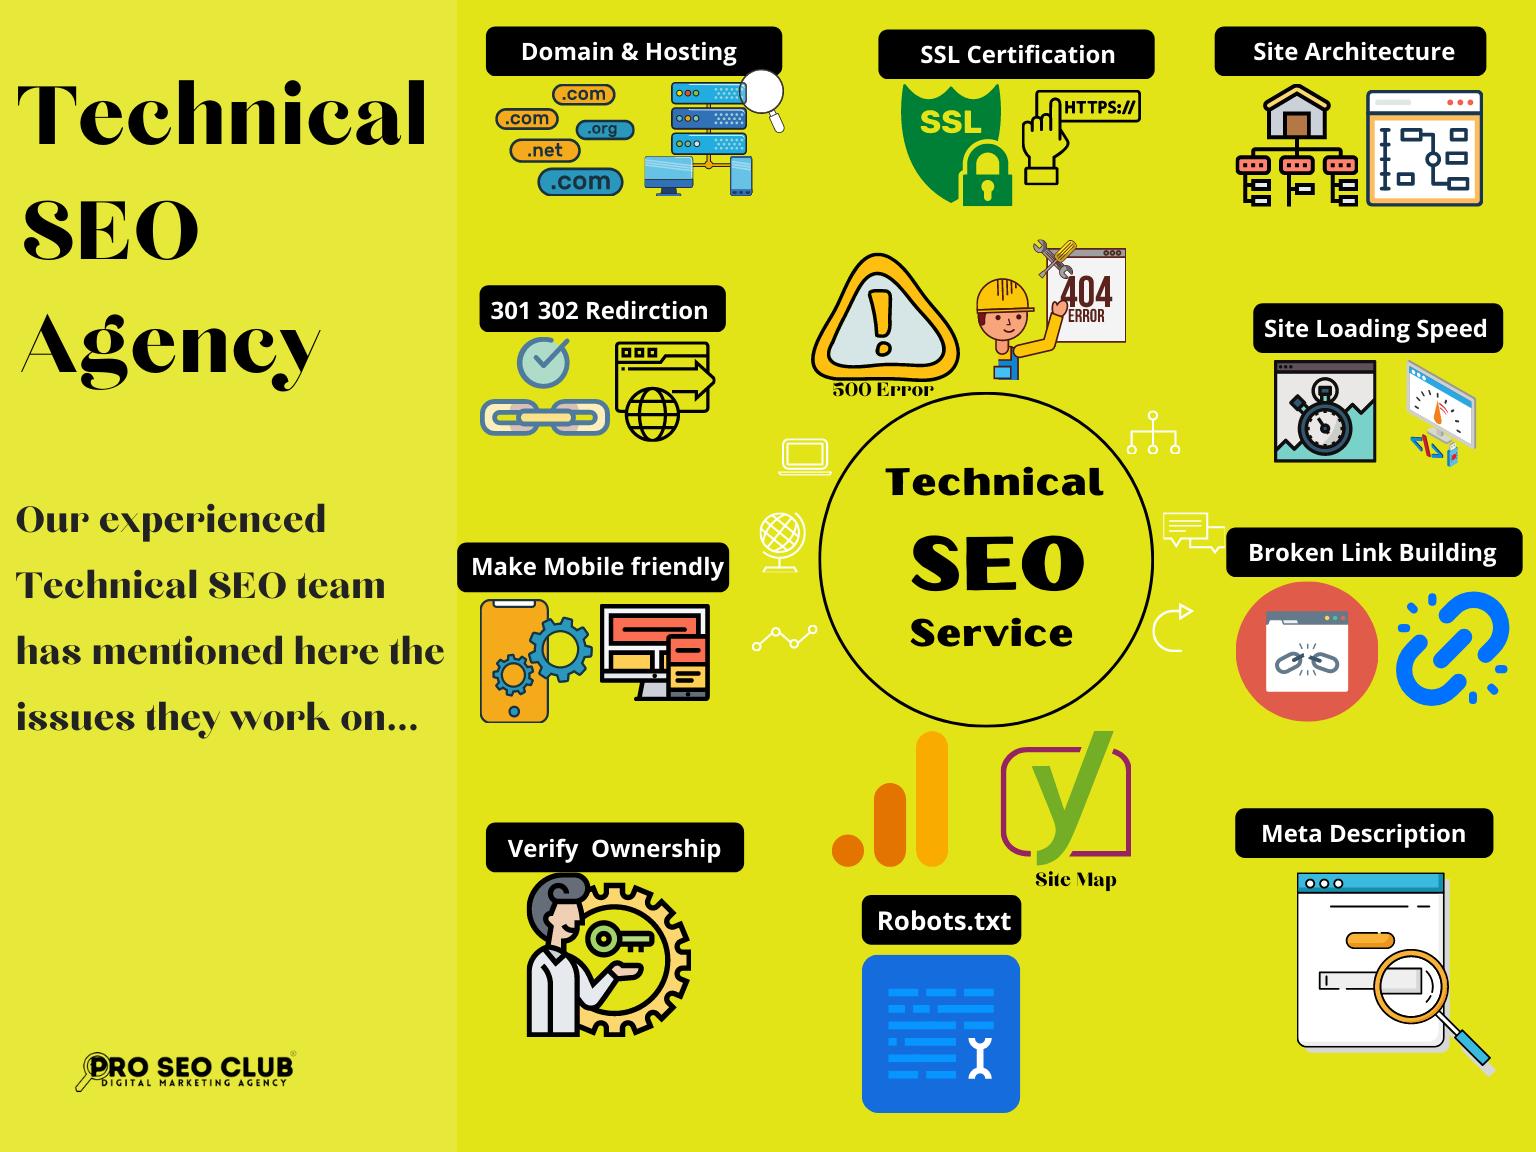 Pro SEO Club Technical Seo Agency